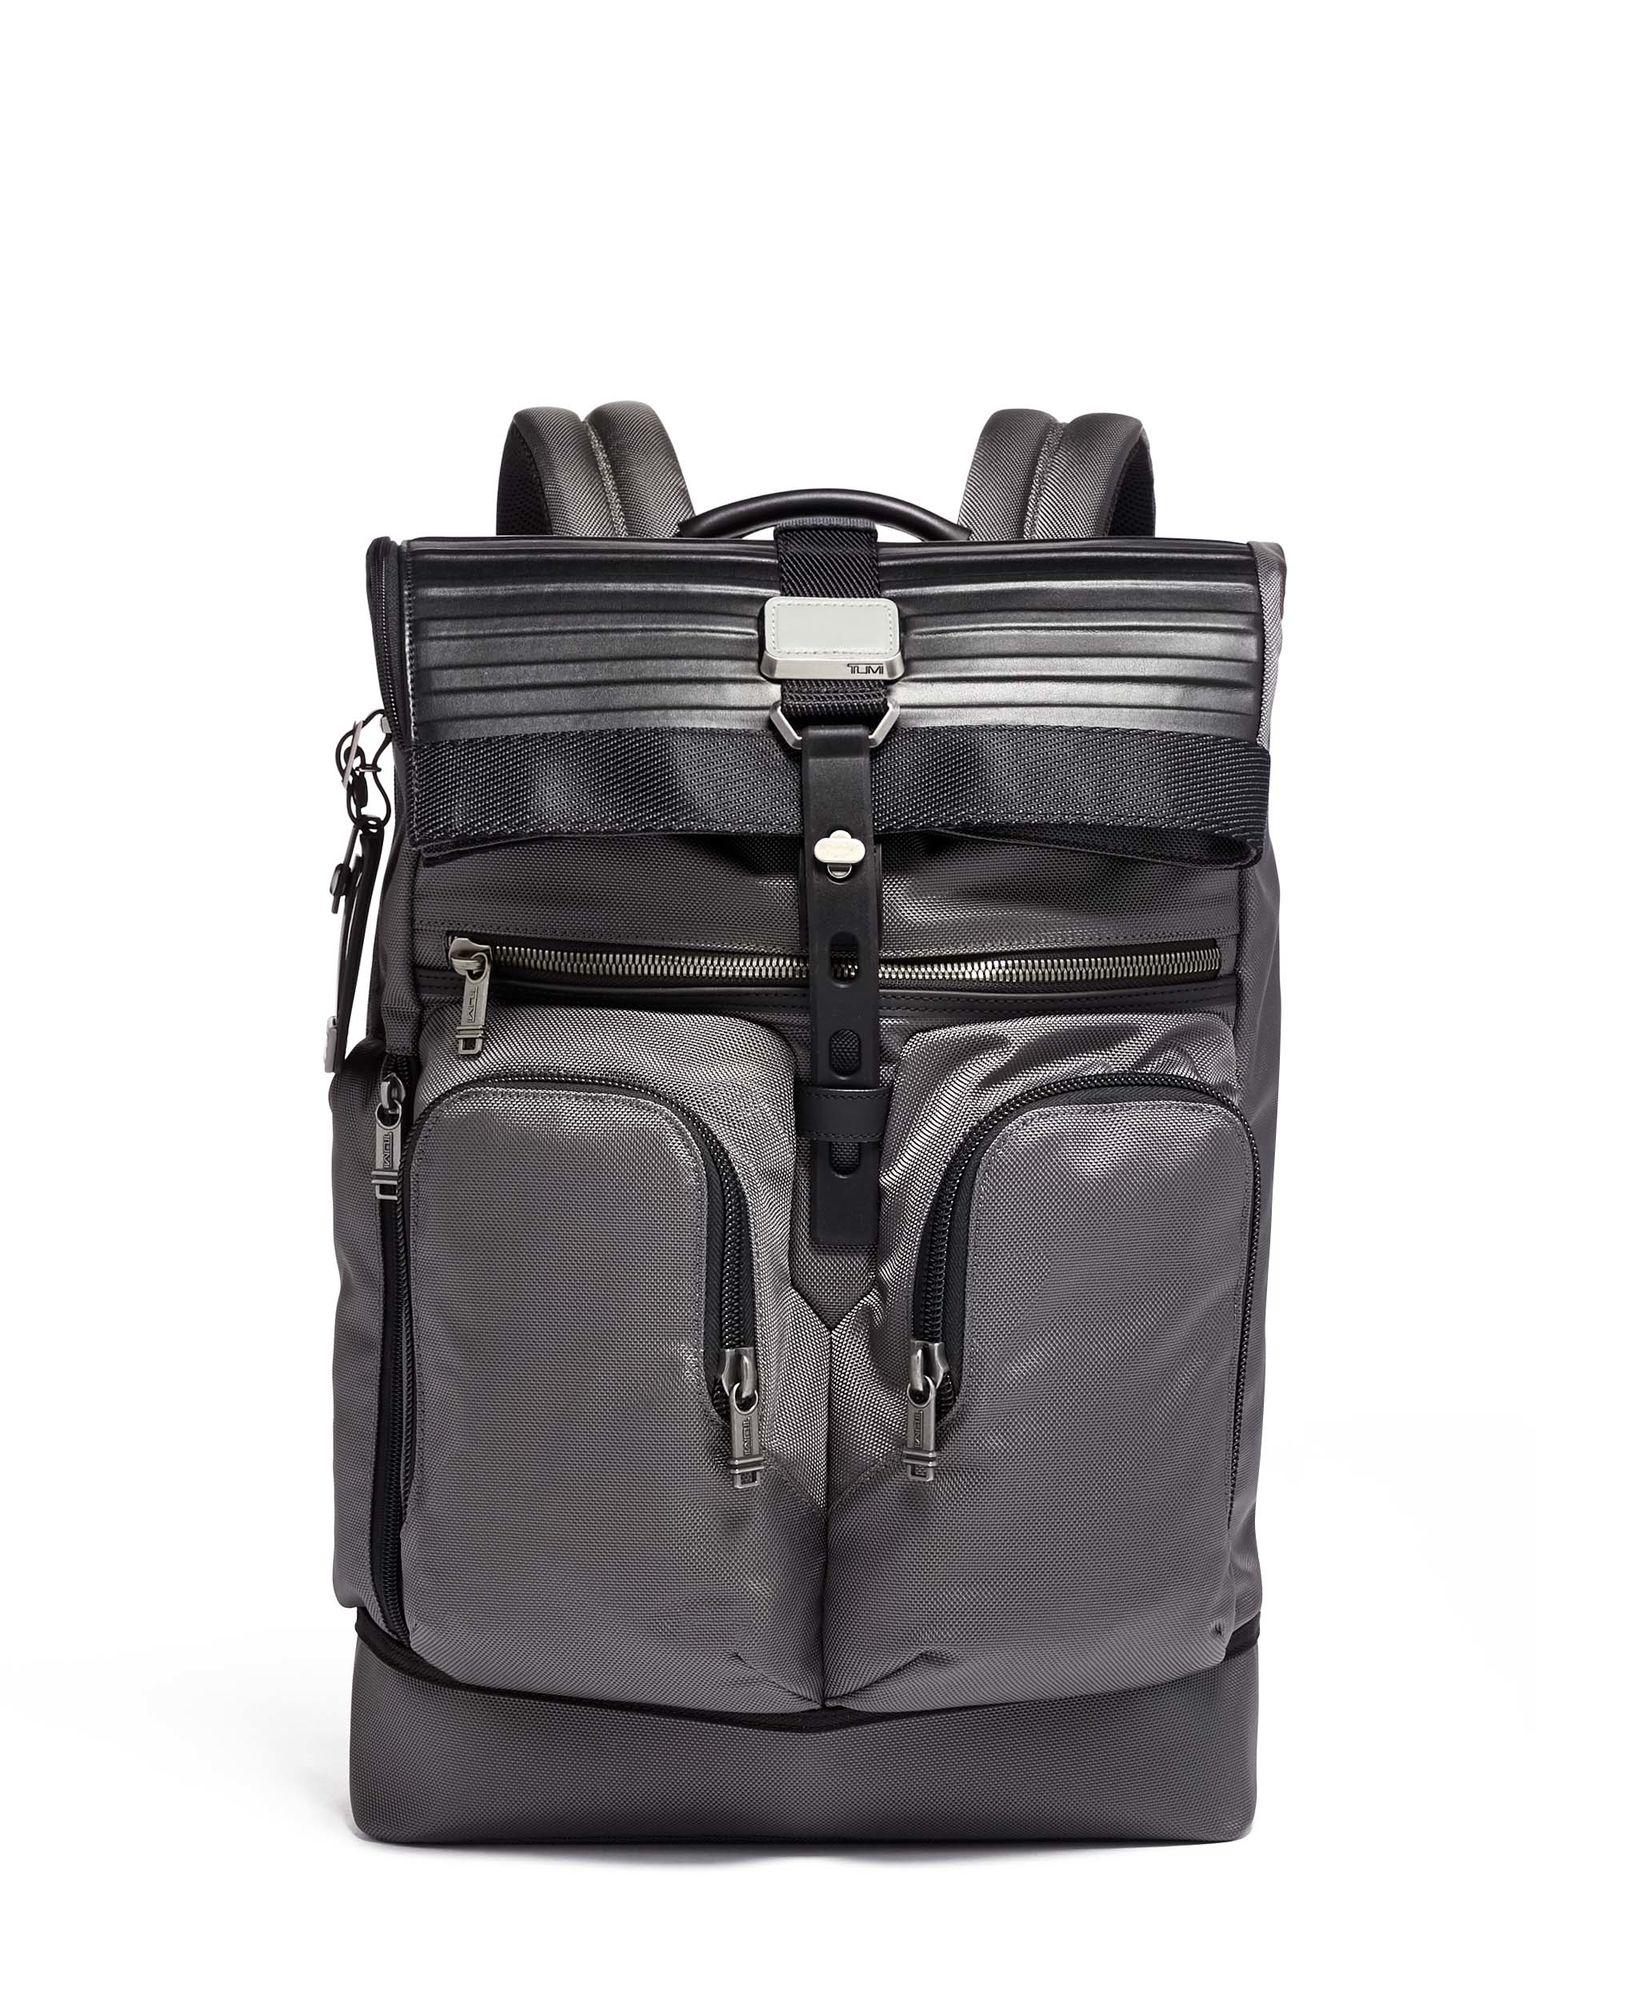 8a518412a5 TUMI Alpha bravo Backpack. TUMI Alpha bravo Sac a dos